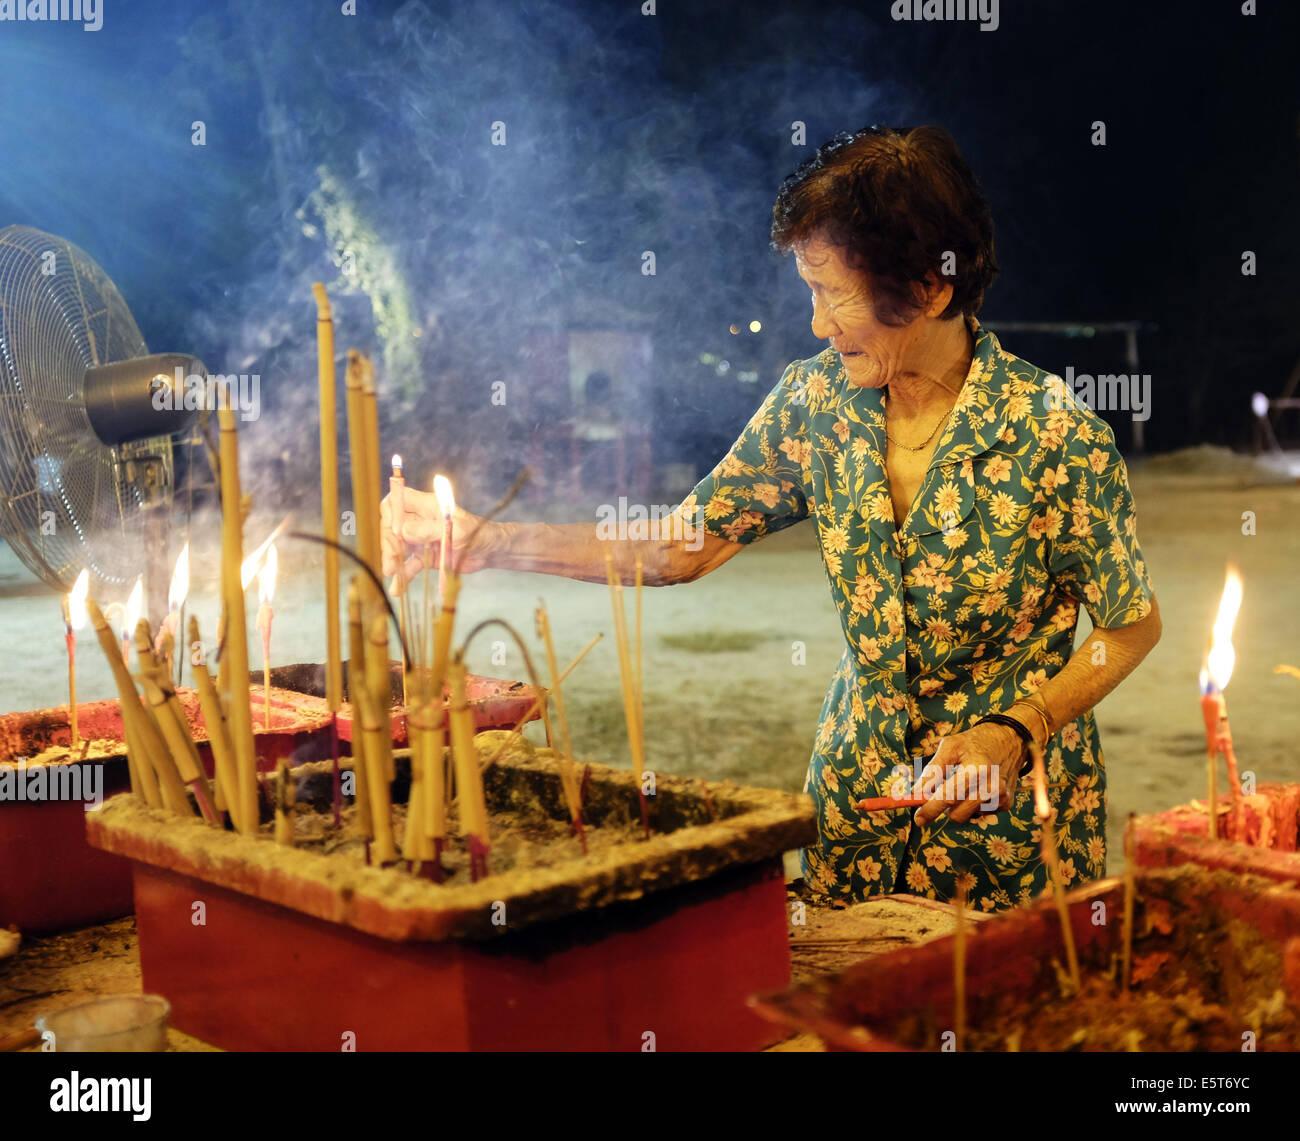 Kajang, SELANGOR, MALAYSIA. 5th Aug, 2014. An Ethnic Chinese devotee handles lit incense sticks during the Hungry - Stock Image